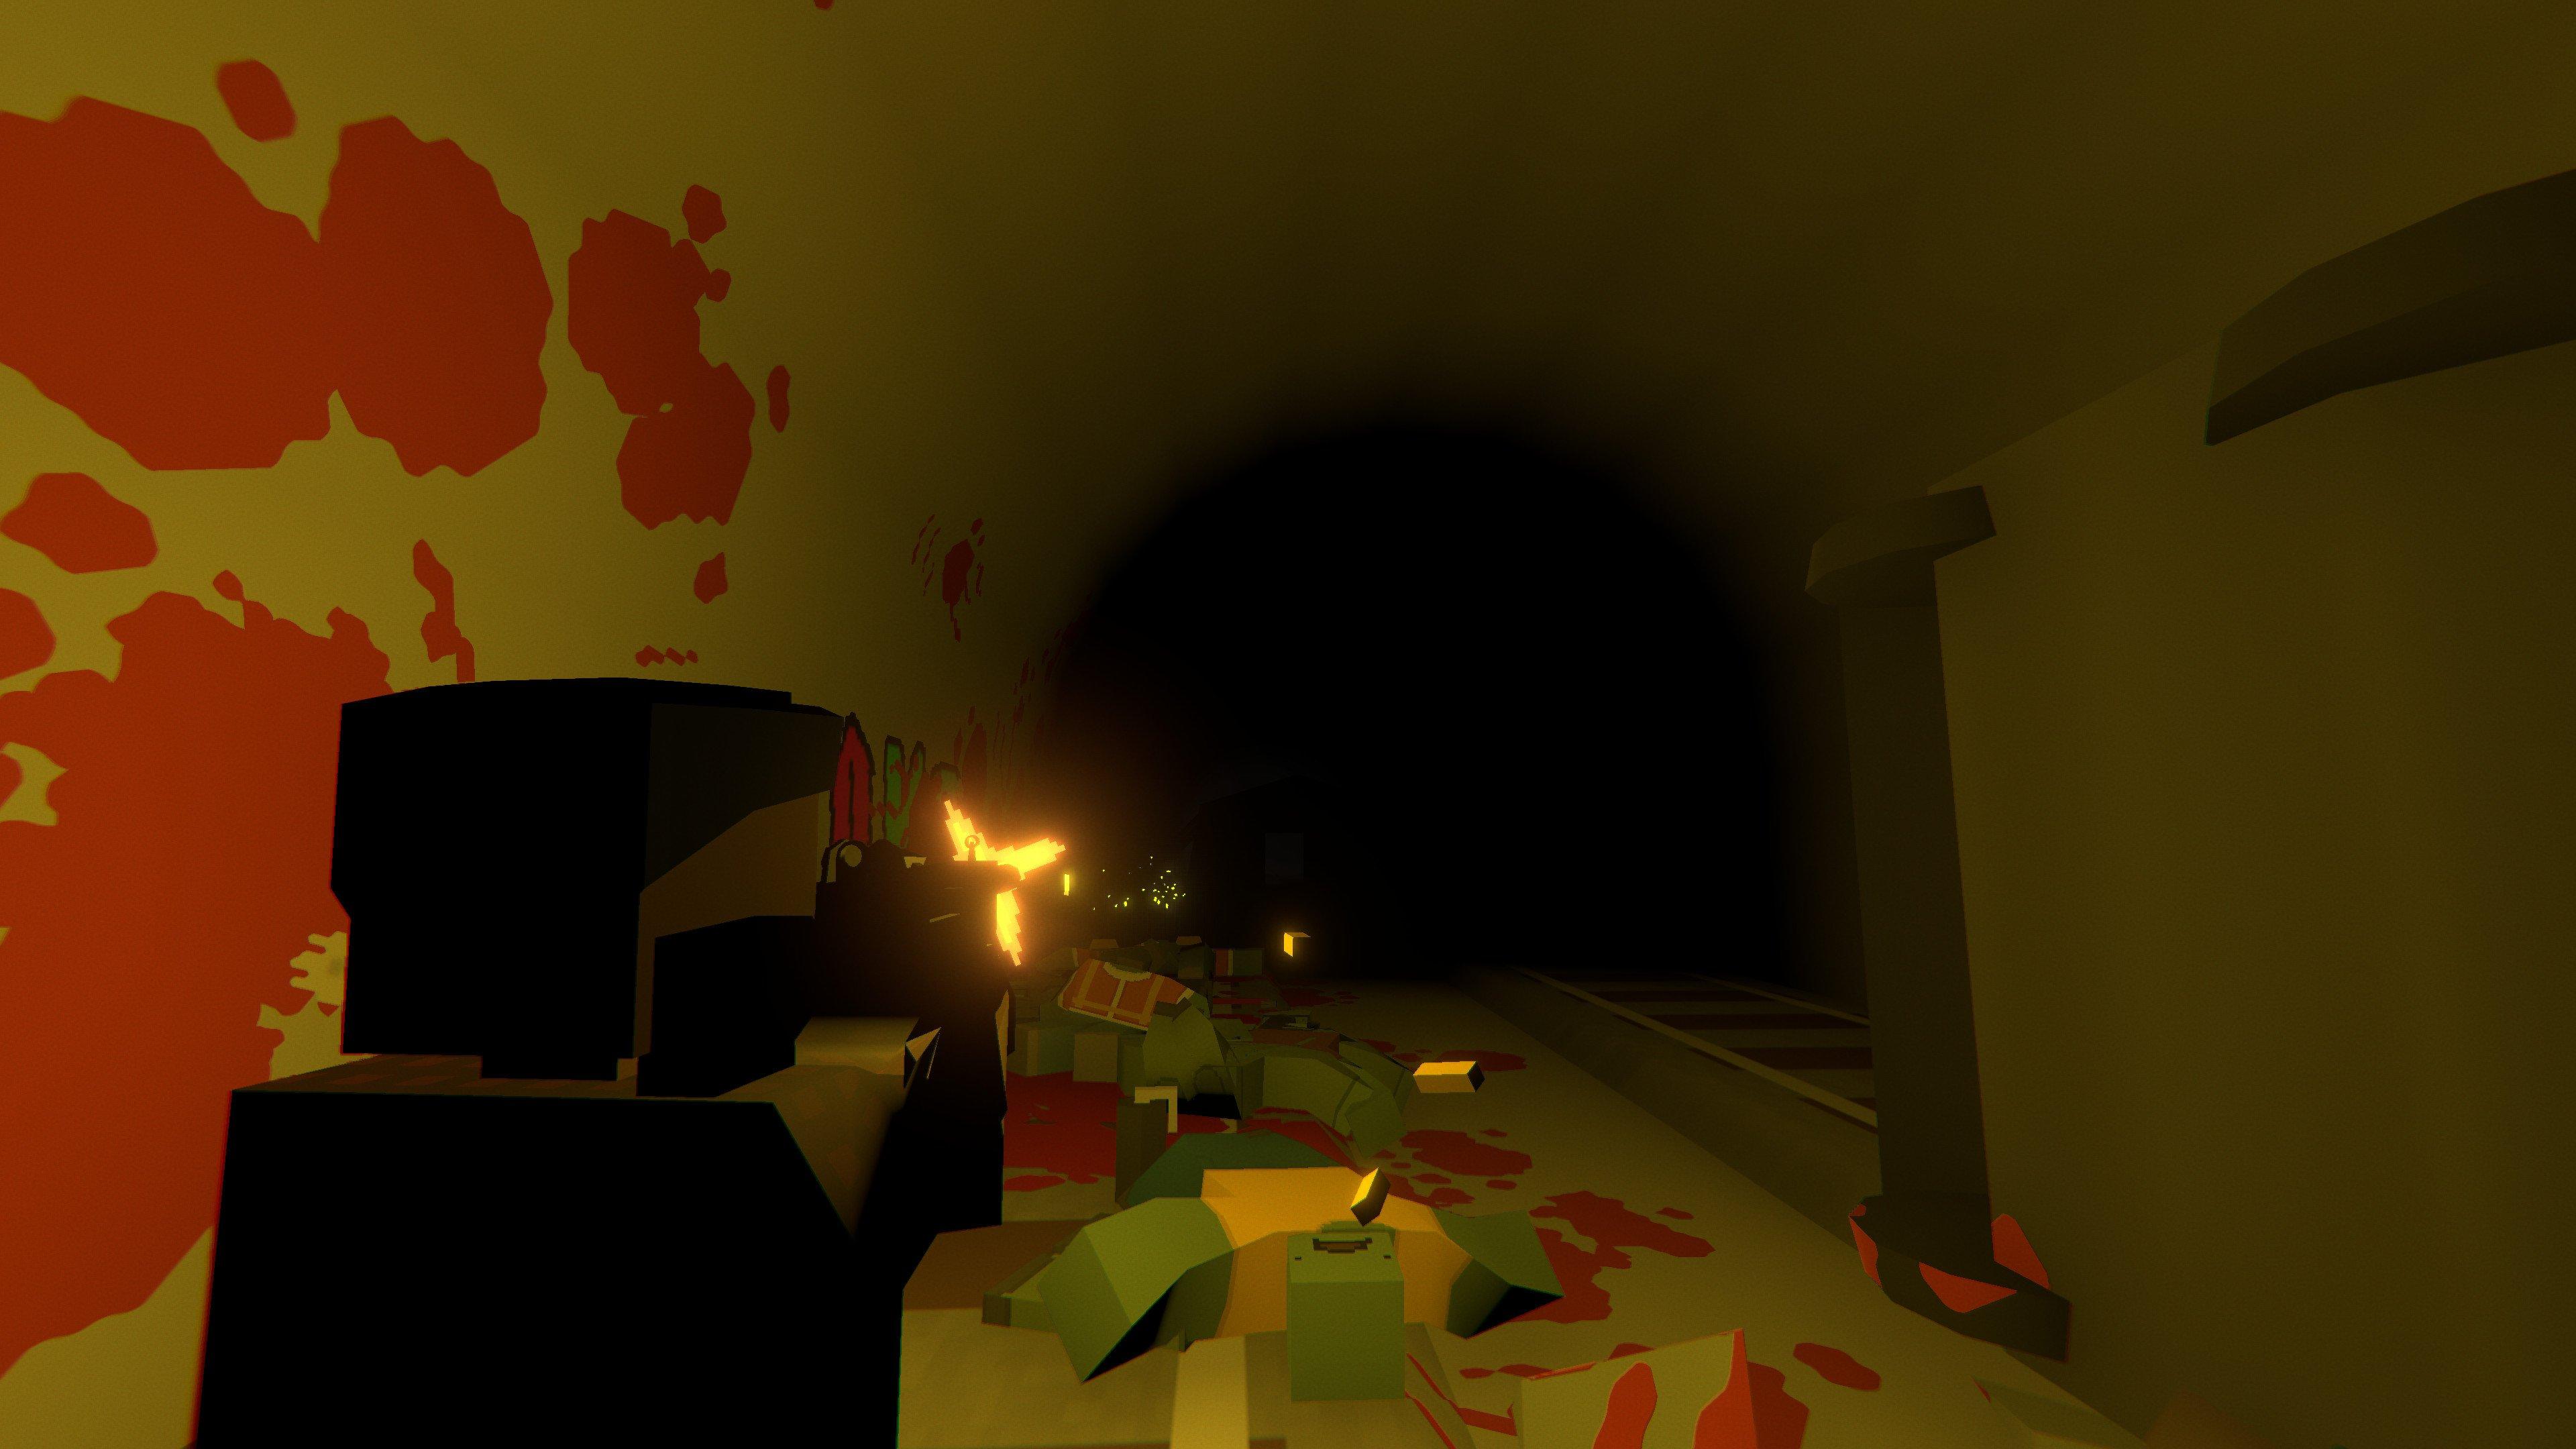 5-gier-podobnych-do-minecraft-unturned-6.jpg